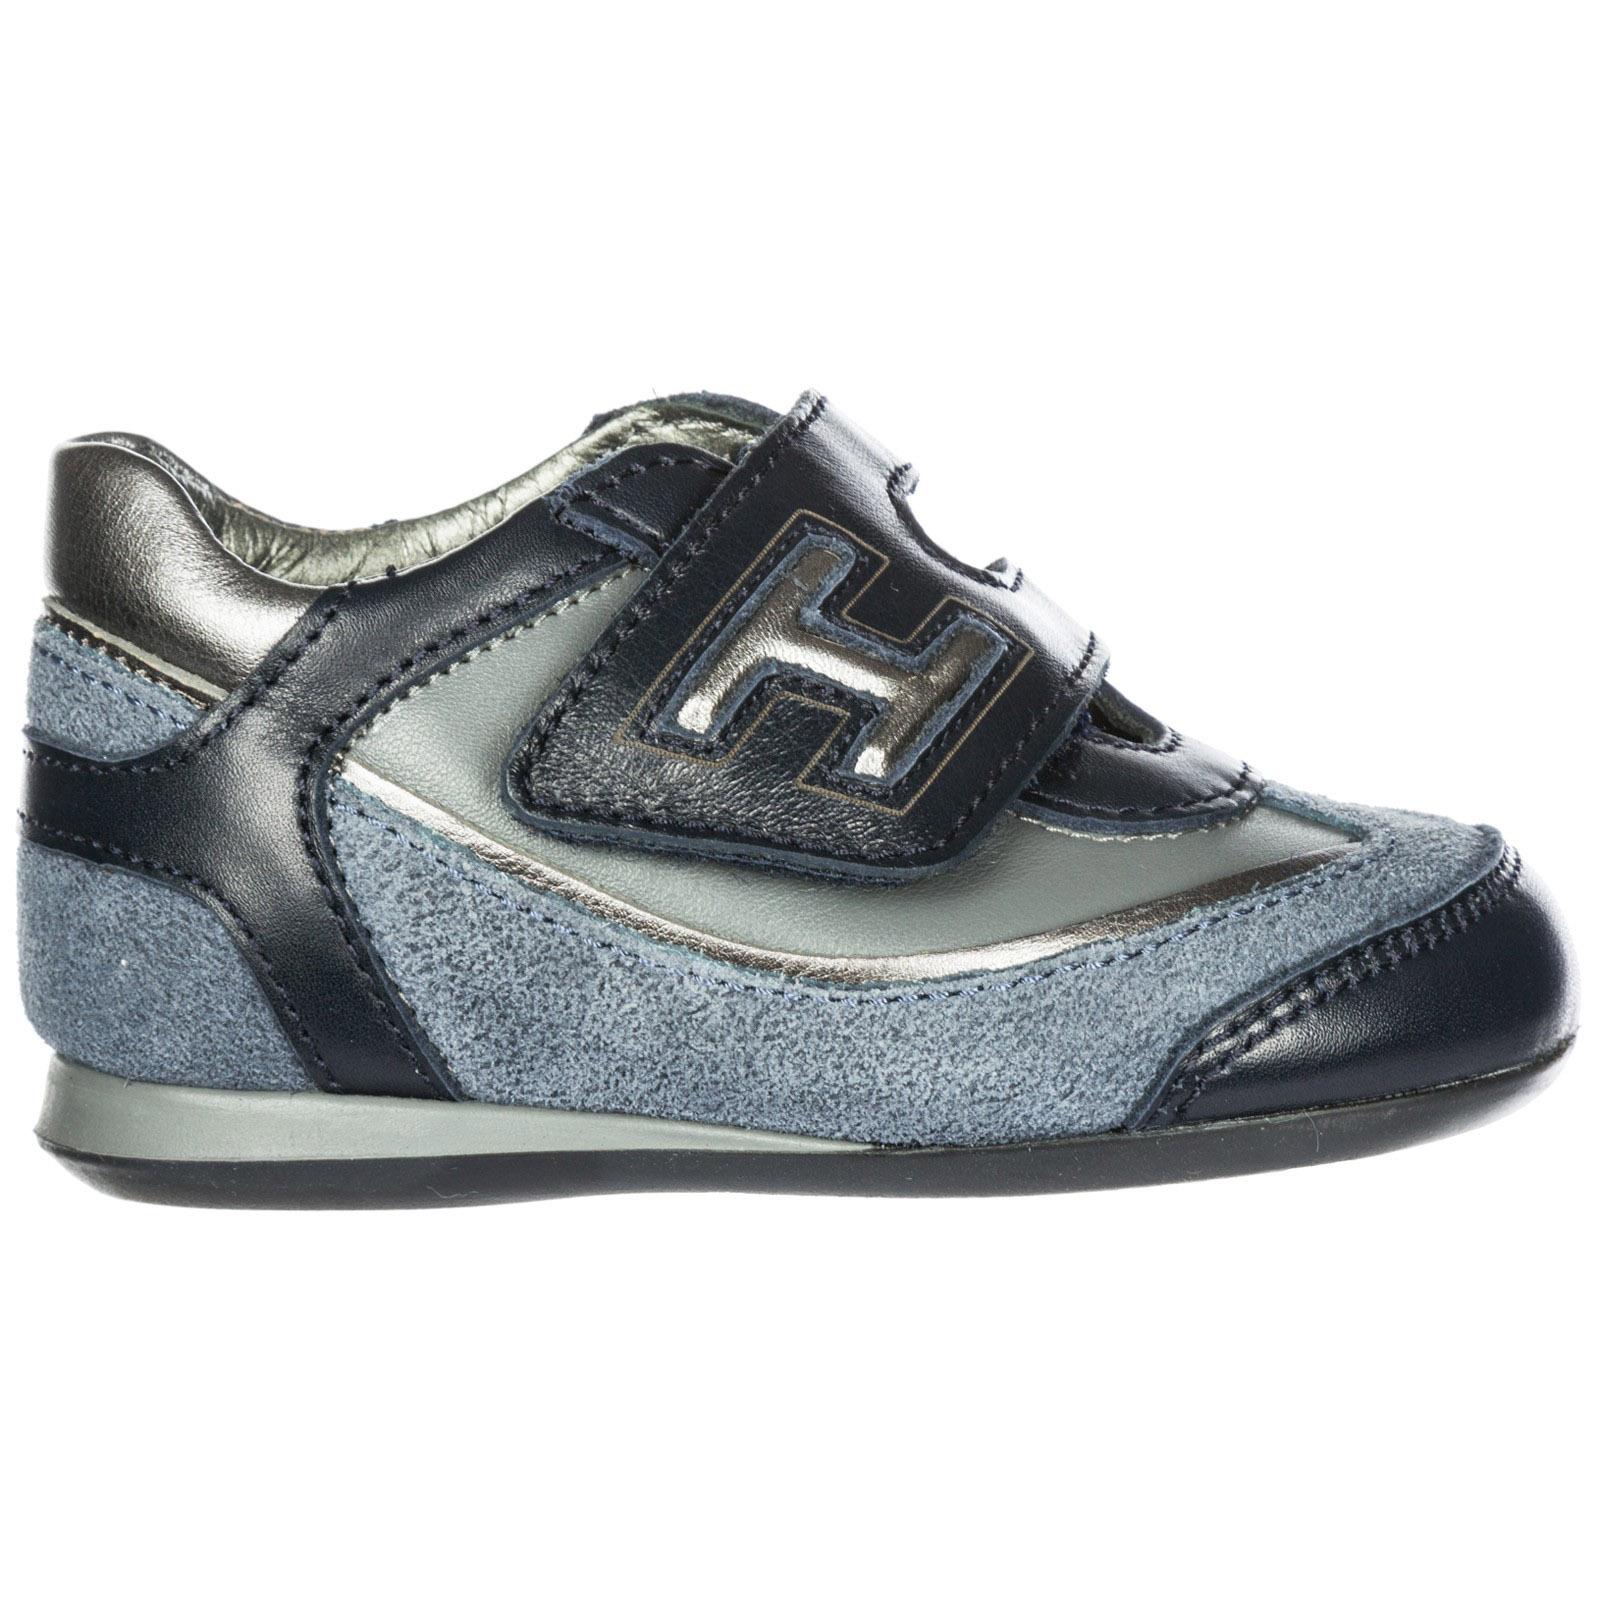 Hogan Hogan Olympia Sneakers Z Blublu Denim Scurobianco